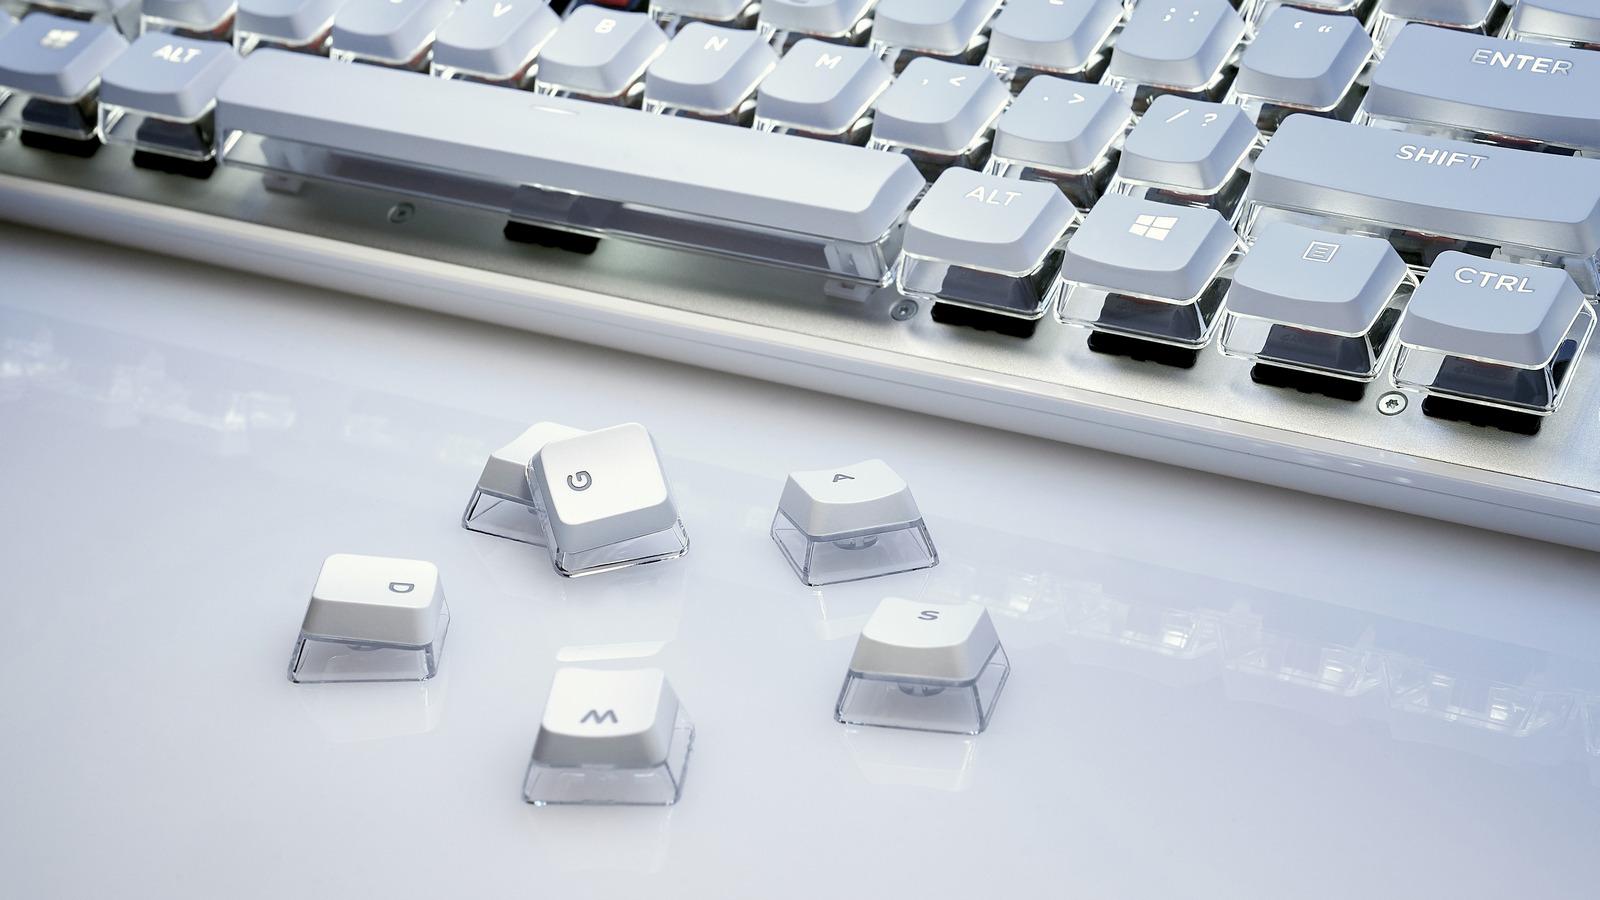 05-keycap-crystalcrown-white